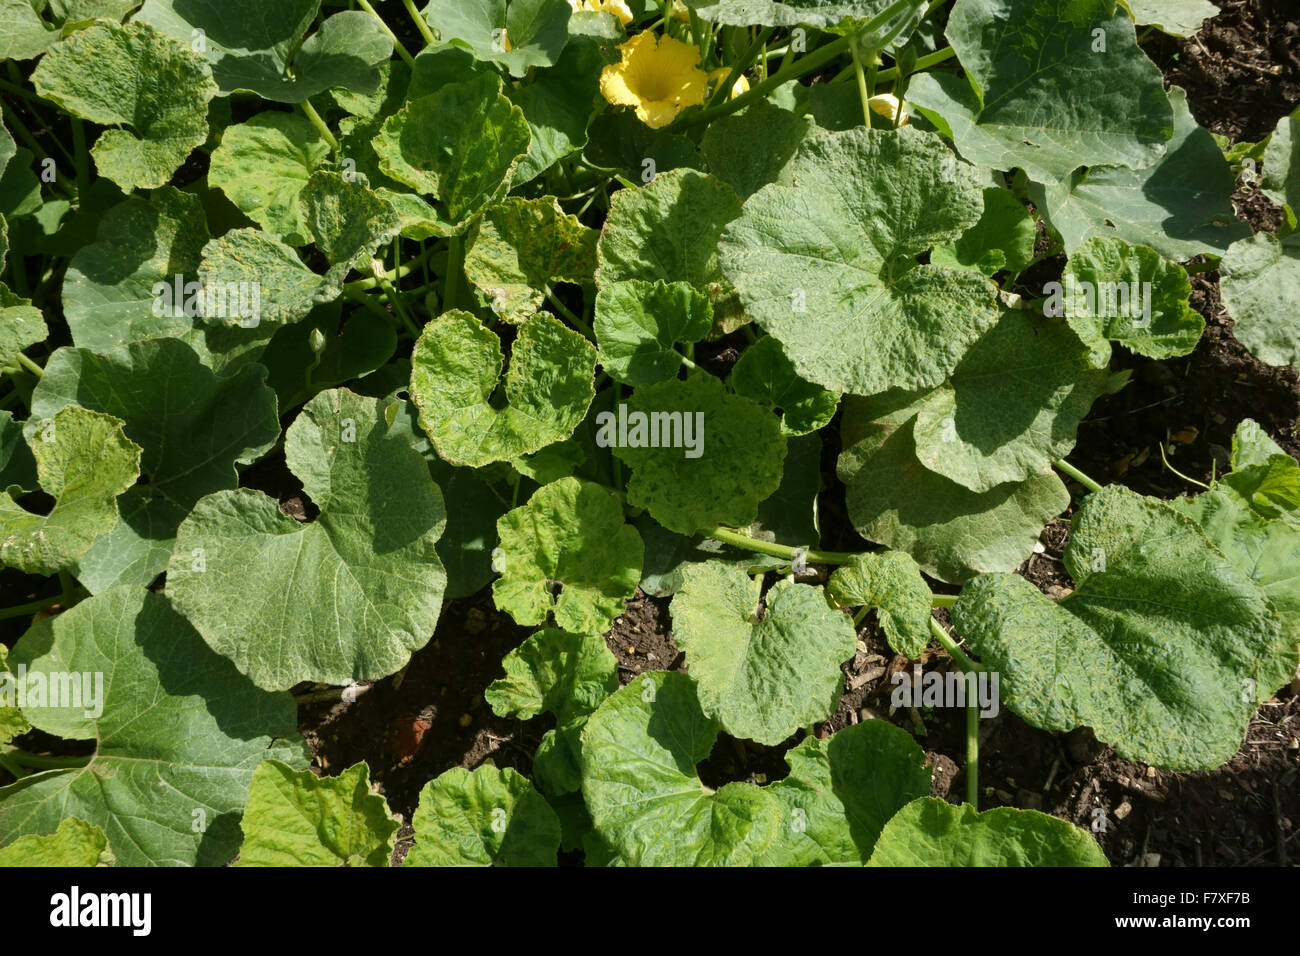 Cucumber mosaic virus, CMV, symptoms on squash plant, Cucurbita spp., Hampshire, England, August Stock Photo